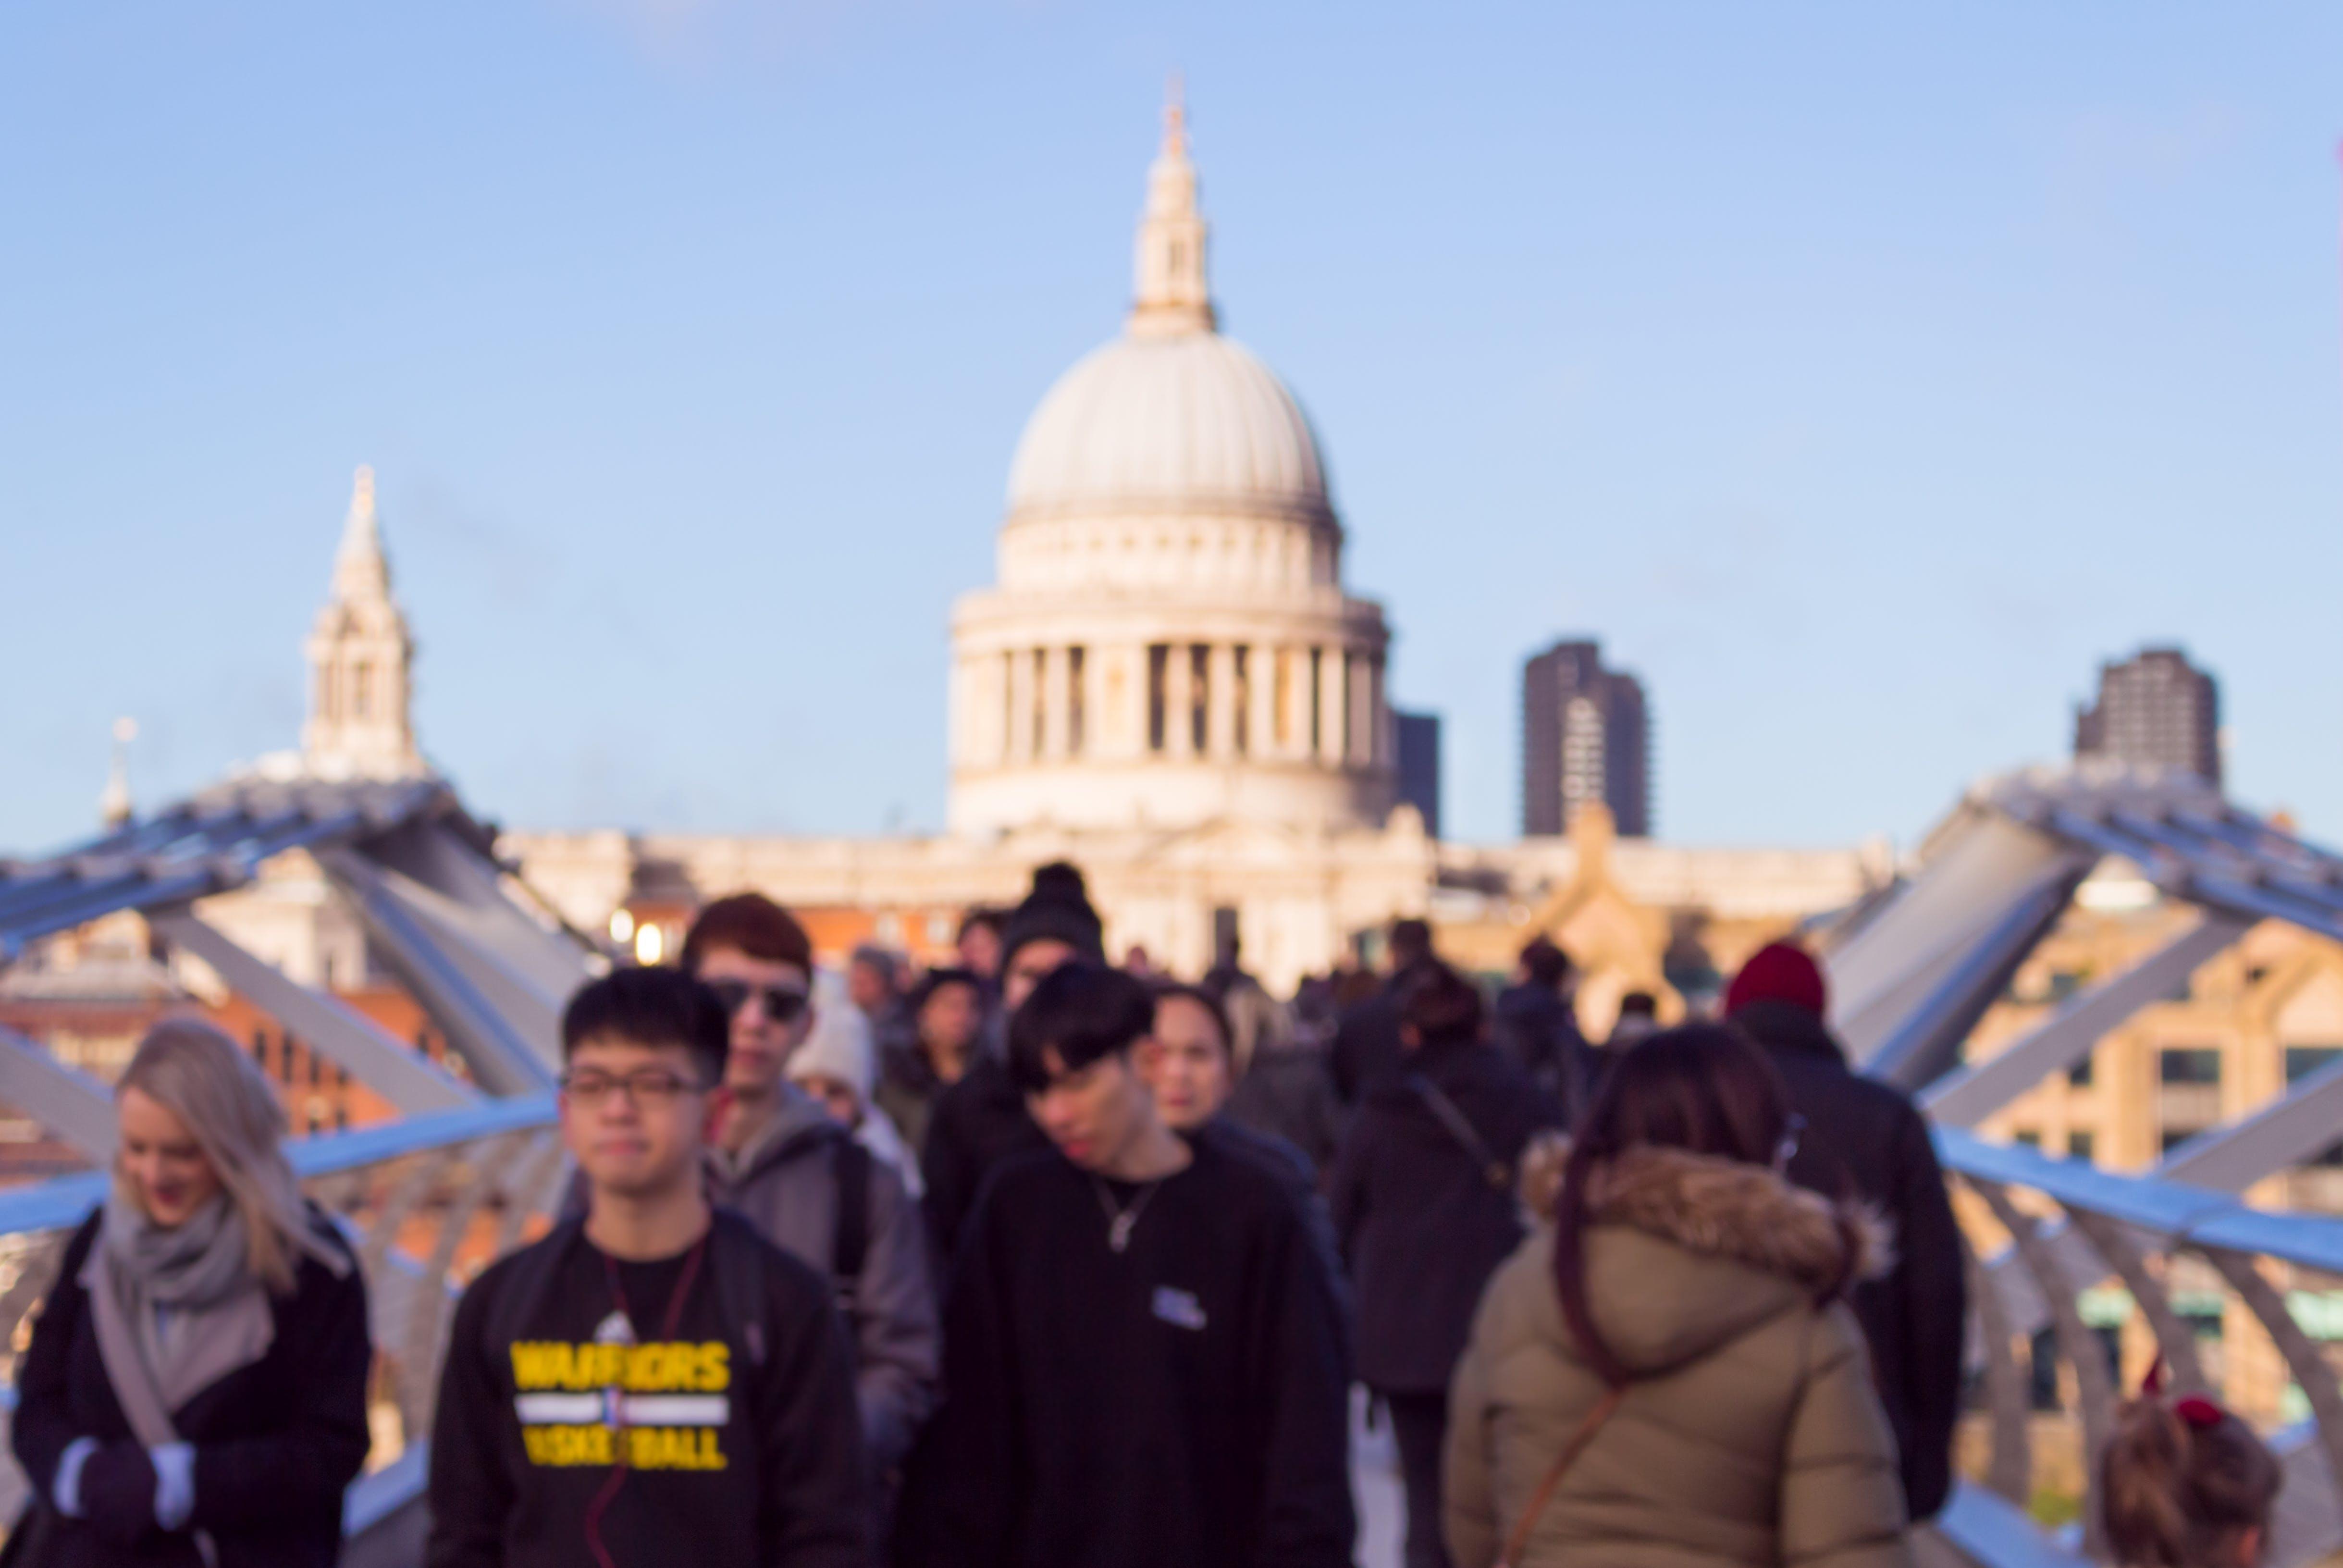 People Walking on Landmark